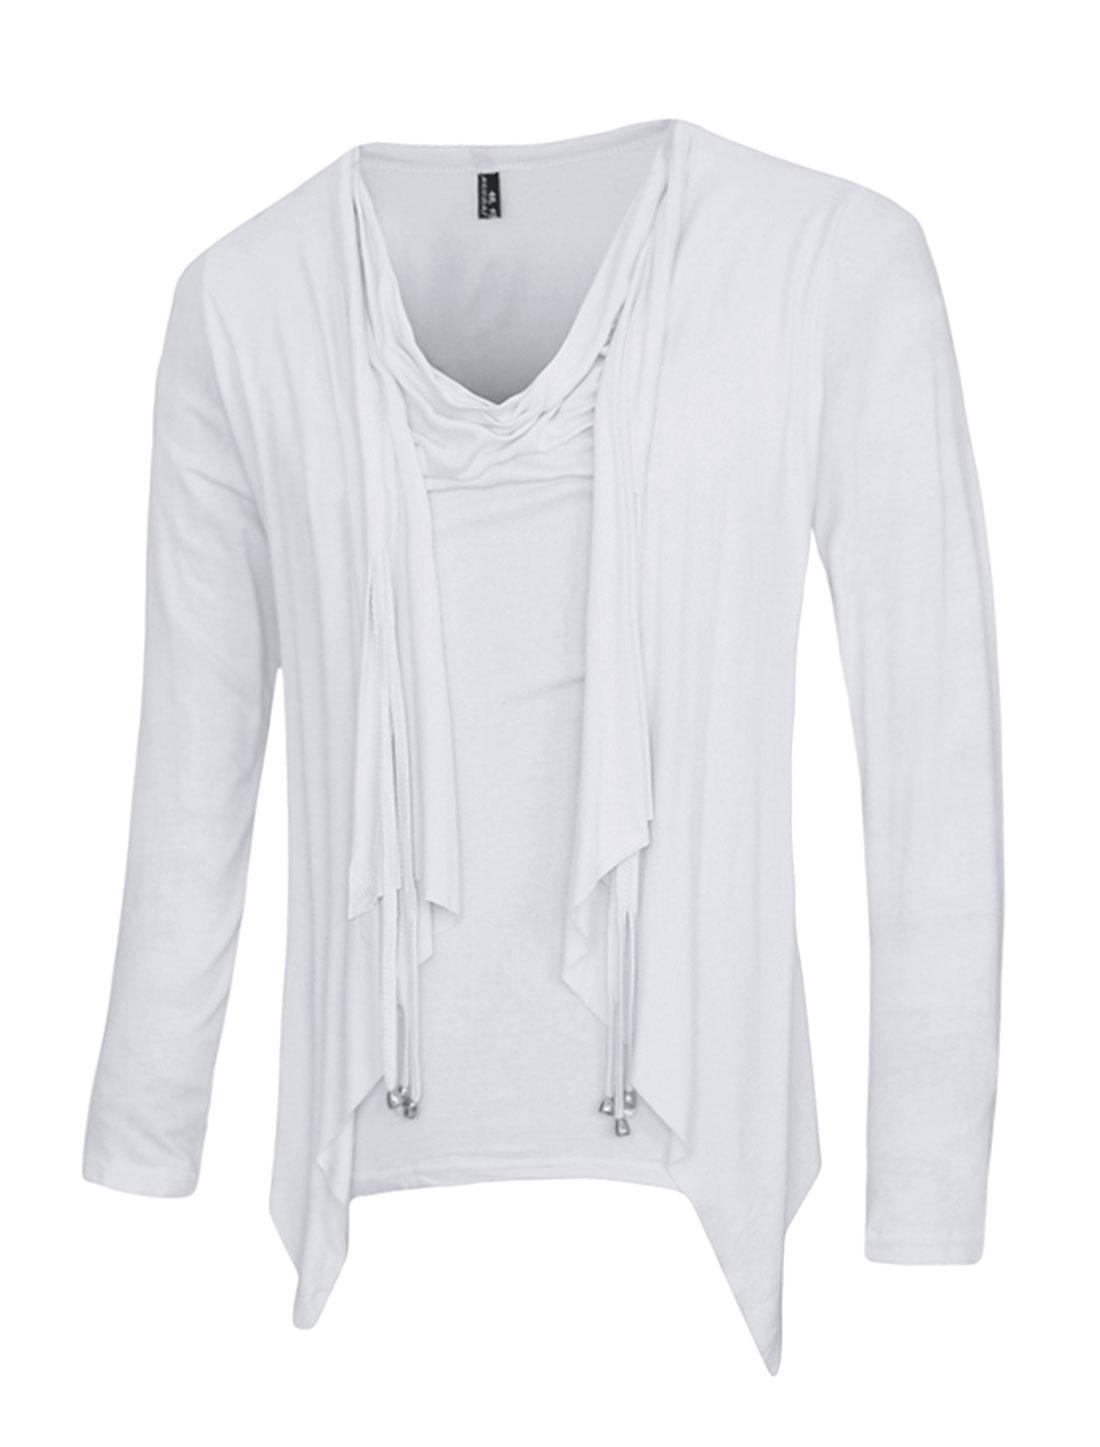 Men Cowl Neck Draped Layered Design Slim Fit T-Shirt White M